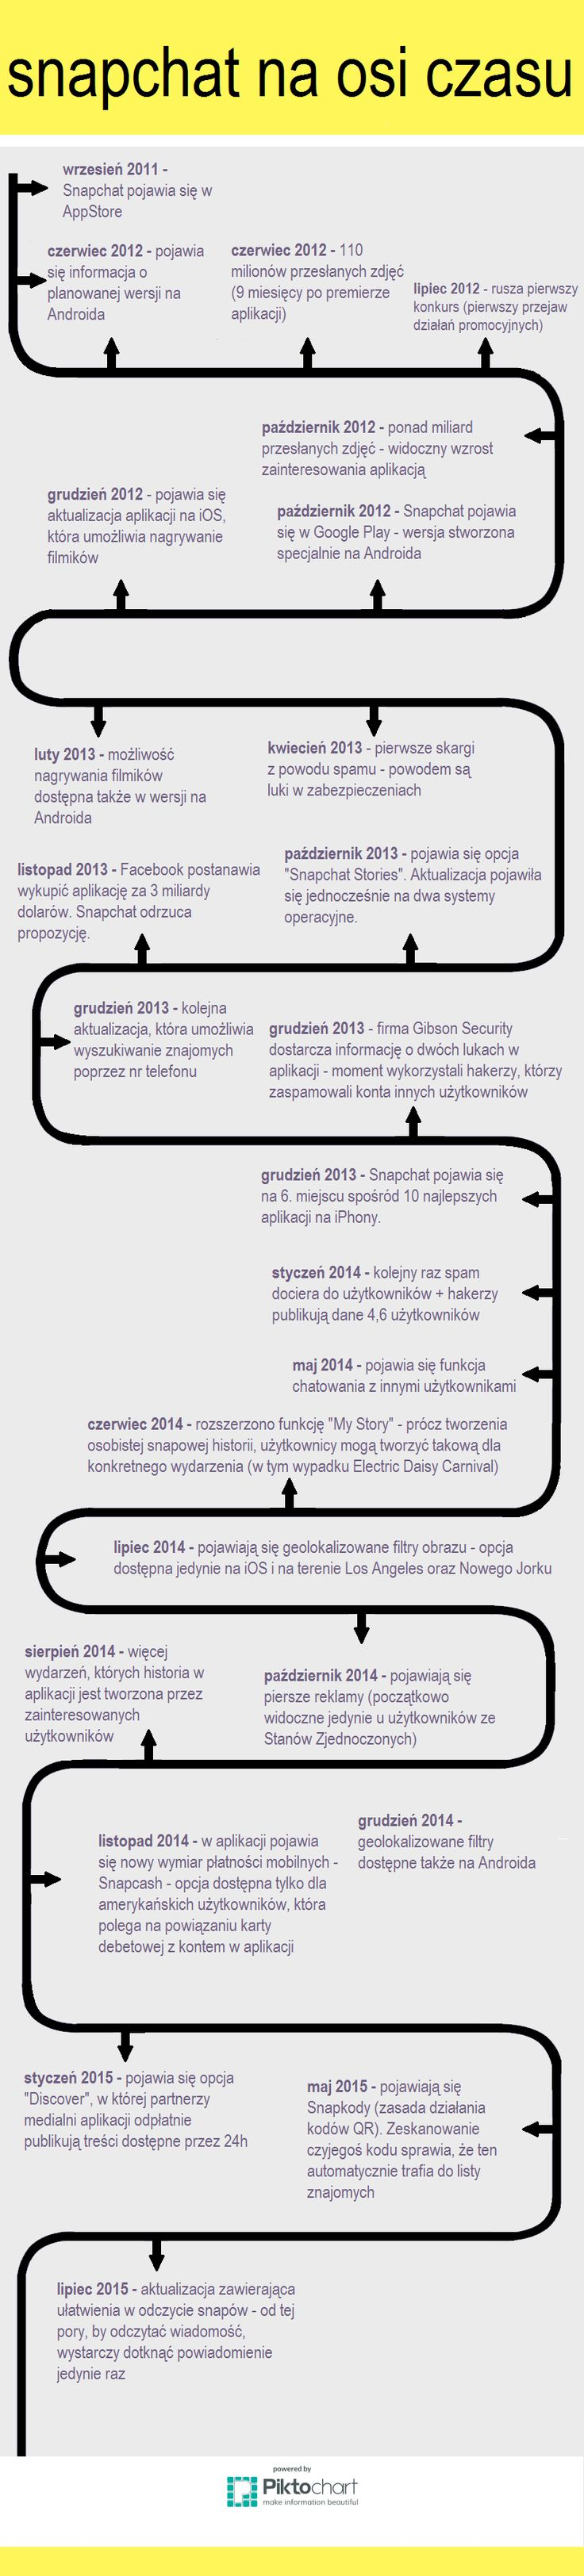 Untitled-Infographic-1.png (Obrazek PNG, 801×3535pikseli) - Skala (16%)